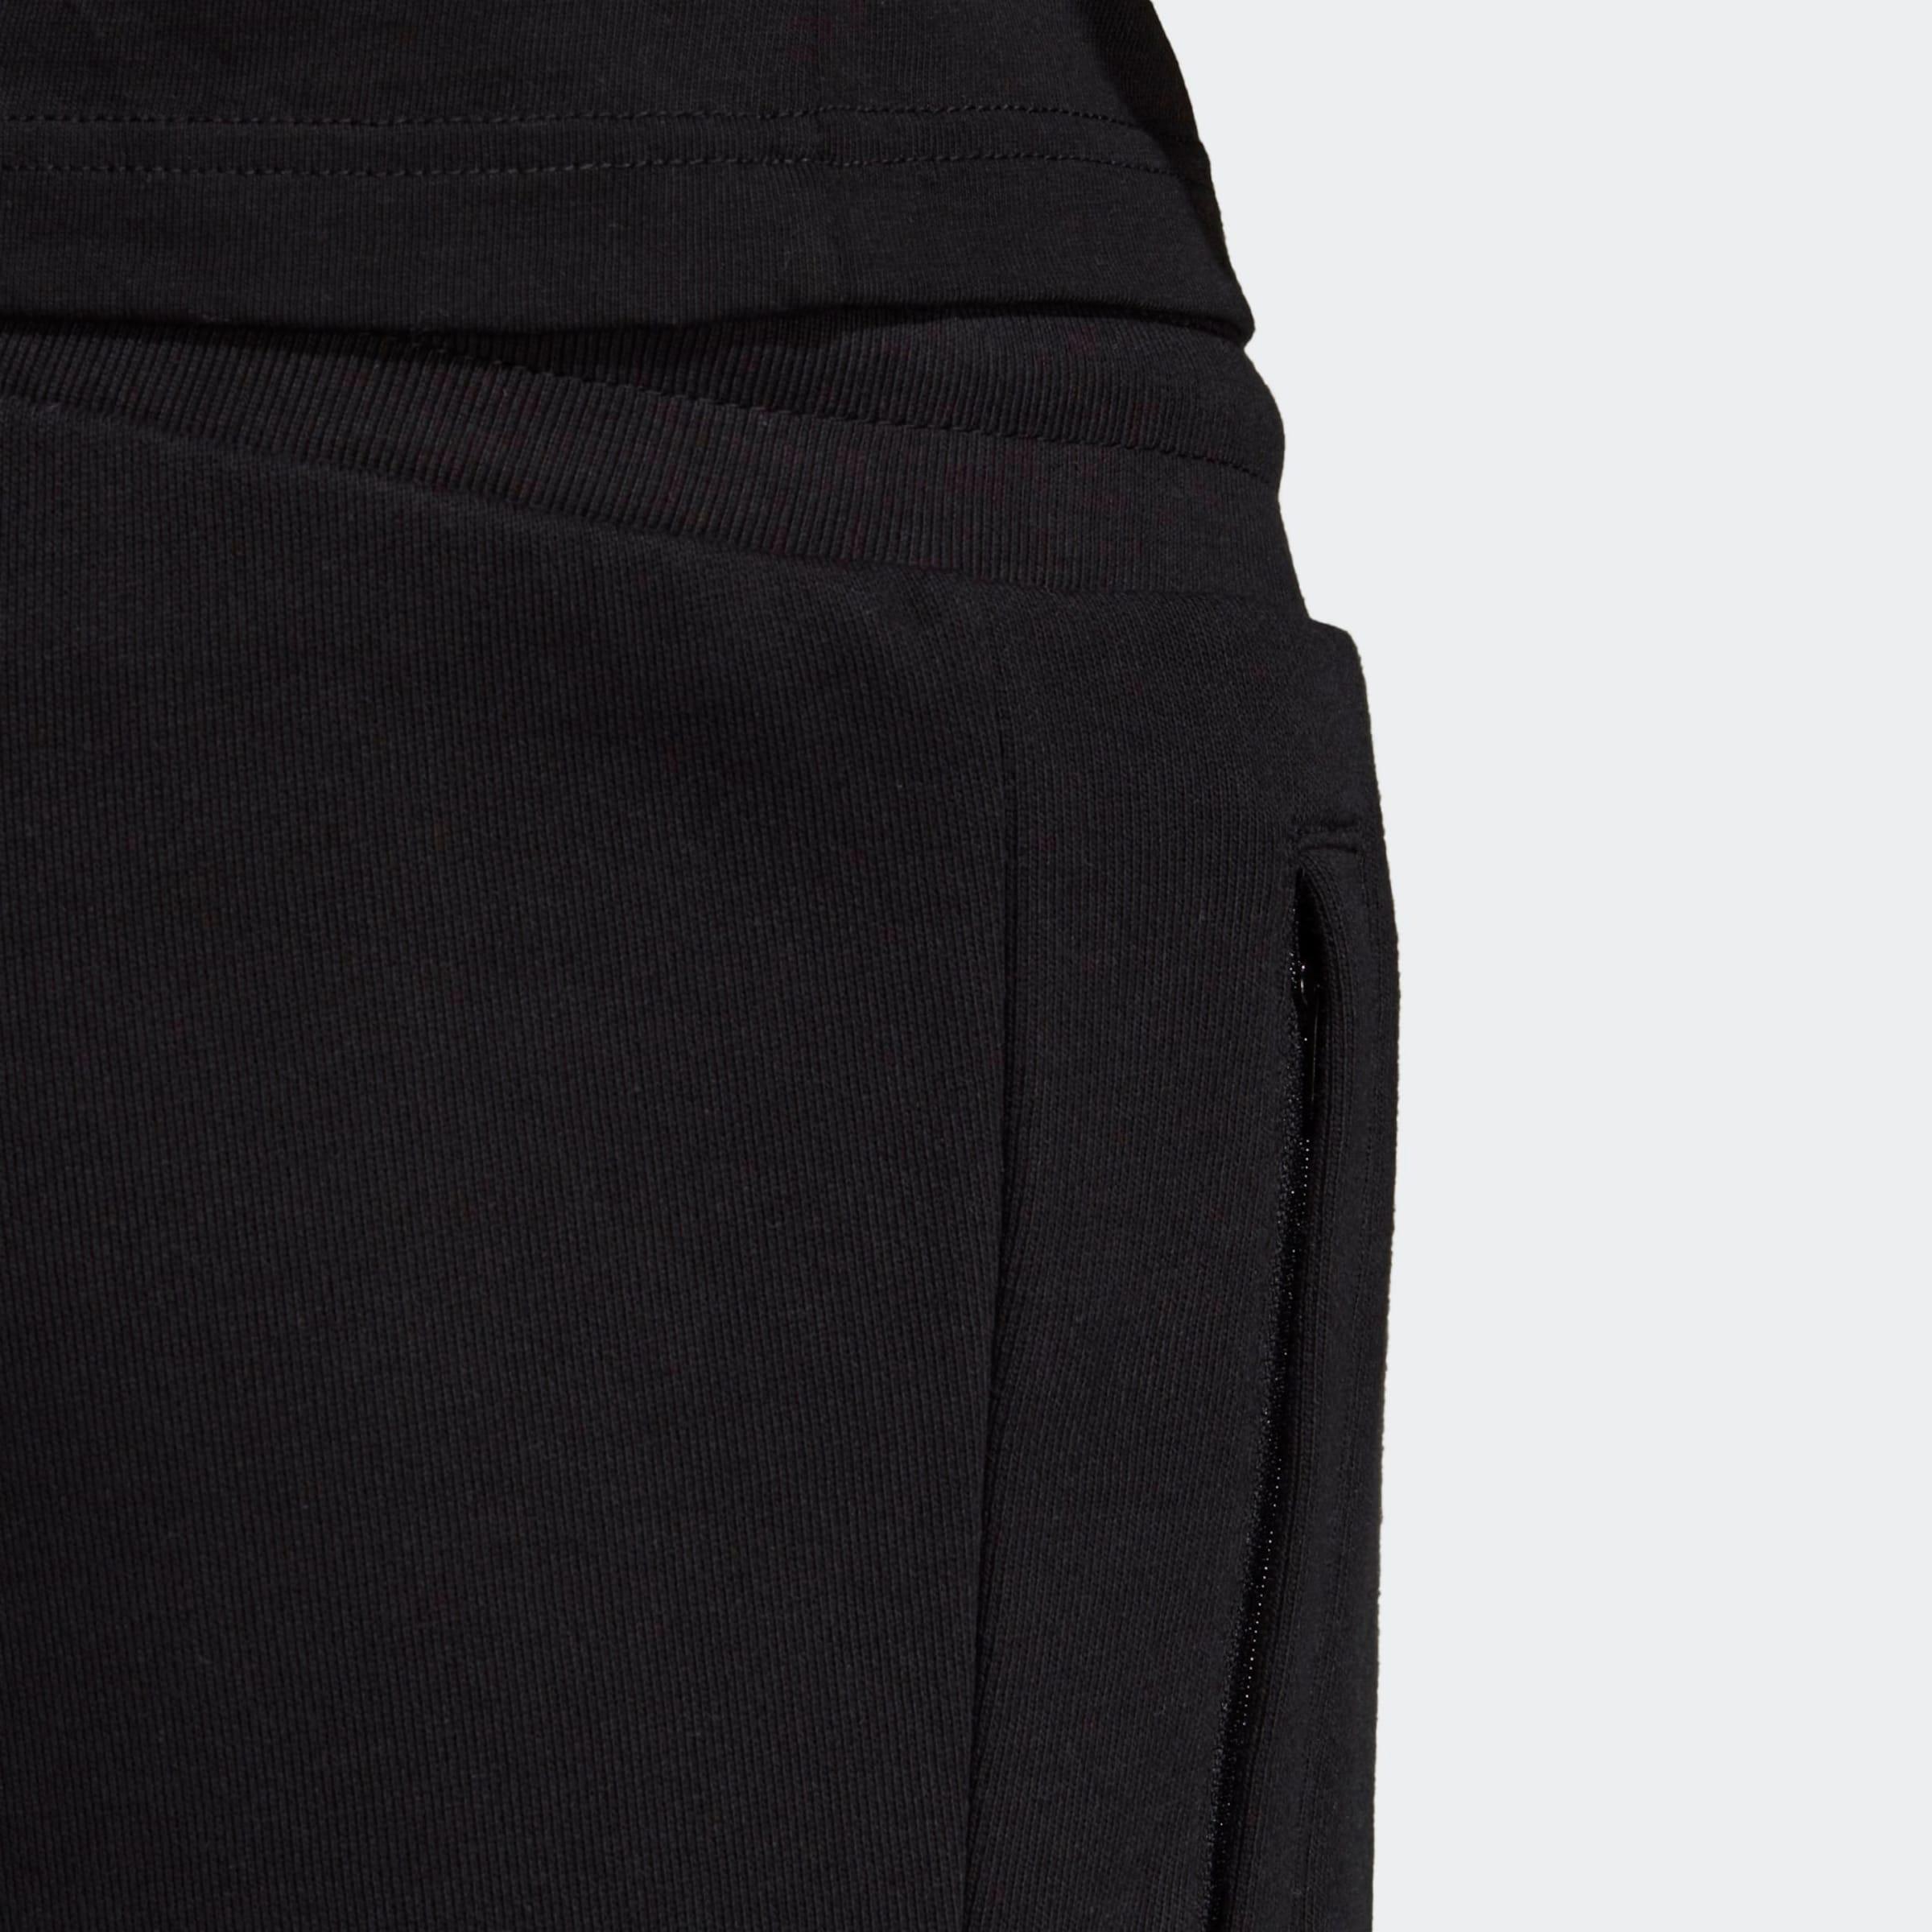 ADIDAS ORIGINALS Byxa 'TREFOIL PANT' i svart